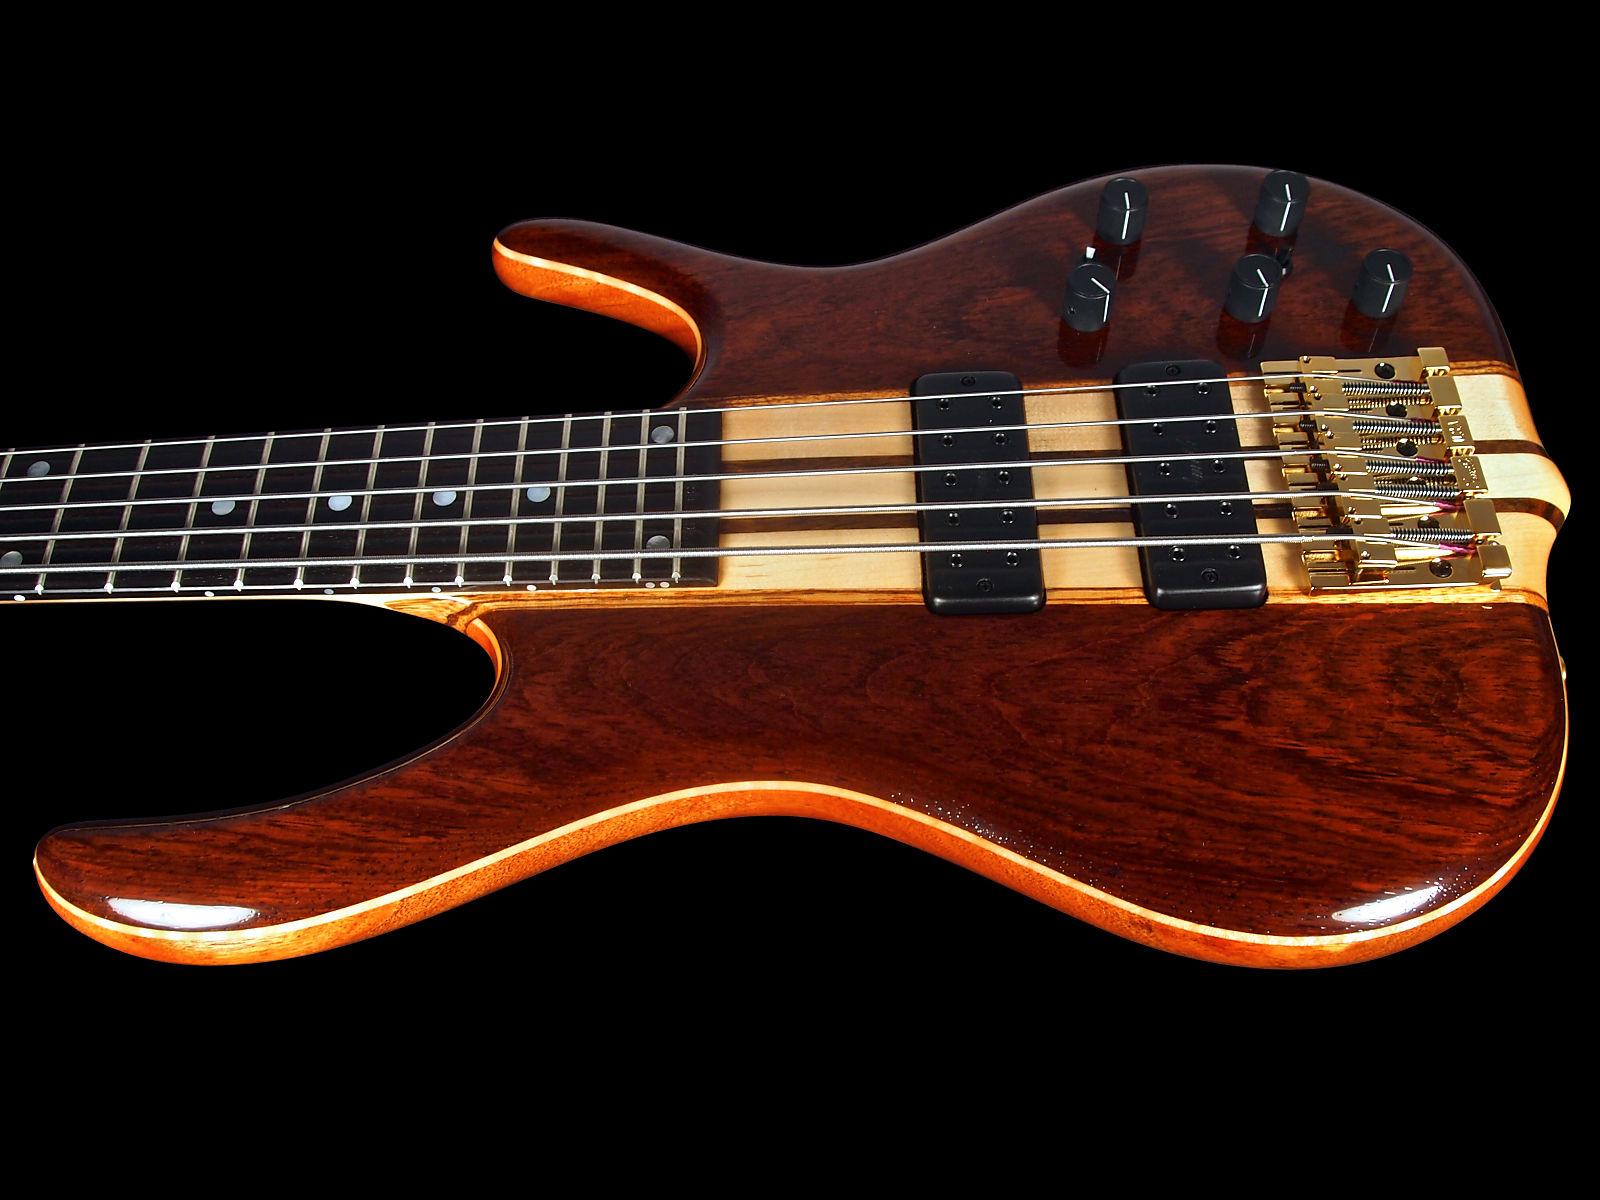 2017 Ken Smith 5EG Elite 5 String Bass W Cocobolo Top Back Neck Thru 18v Preamp Gloss